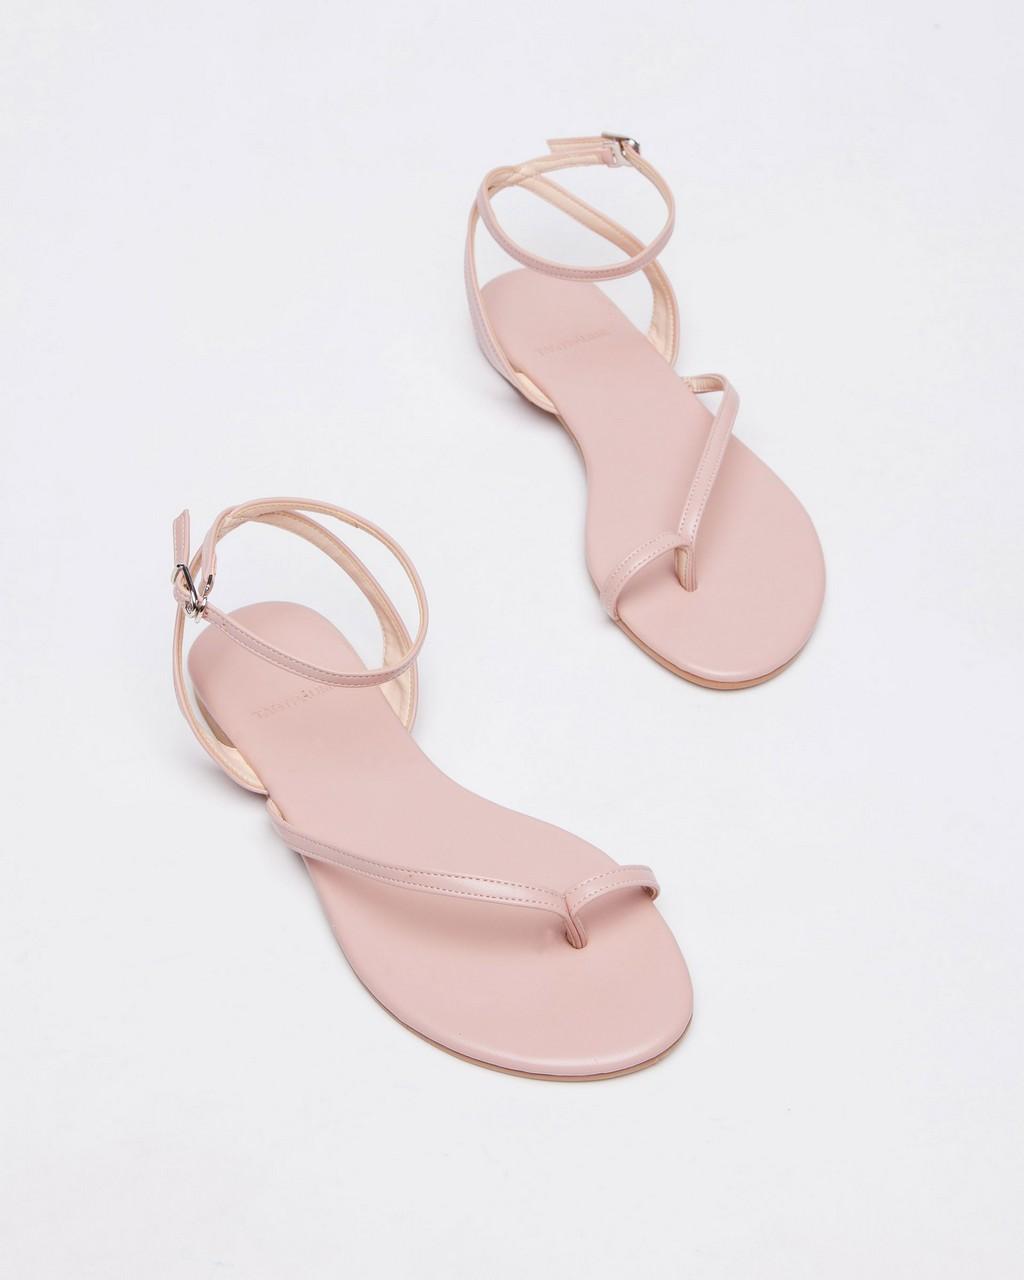 Tagtraume Splash - Pink PU(핑크 PU)